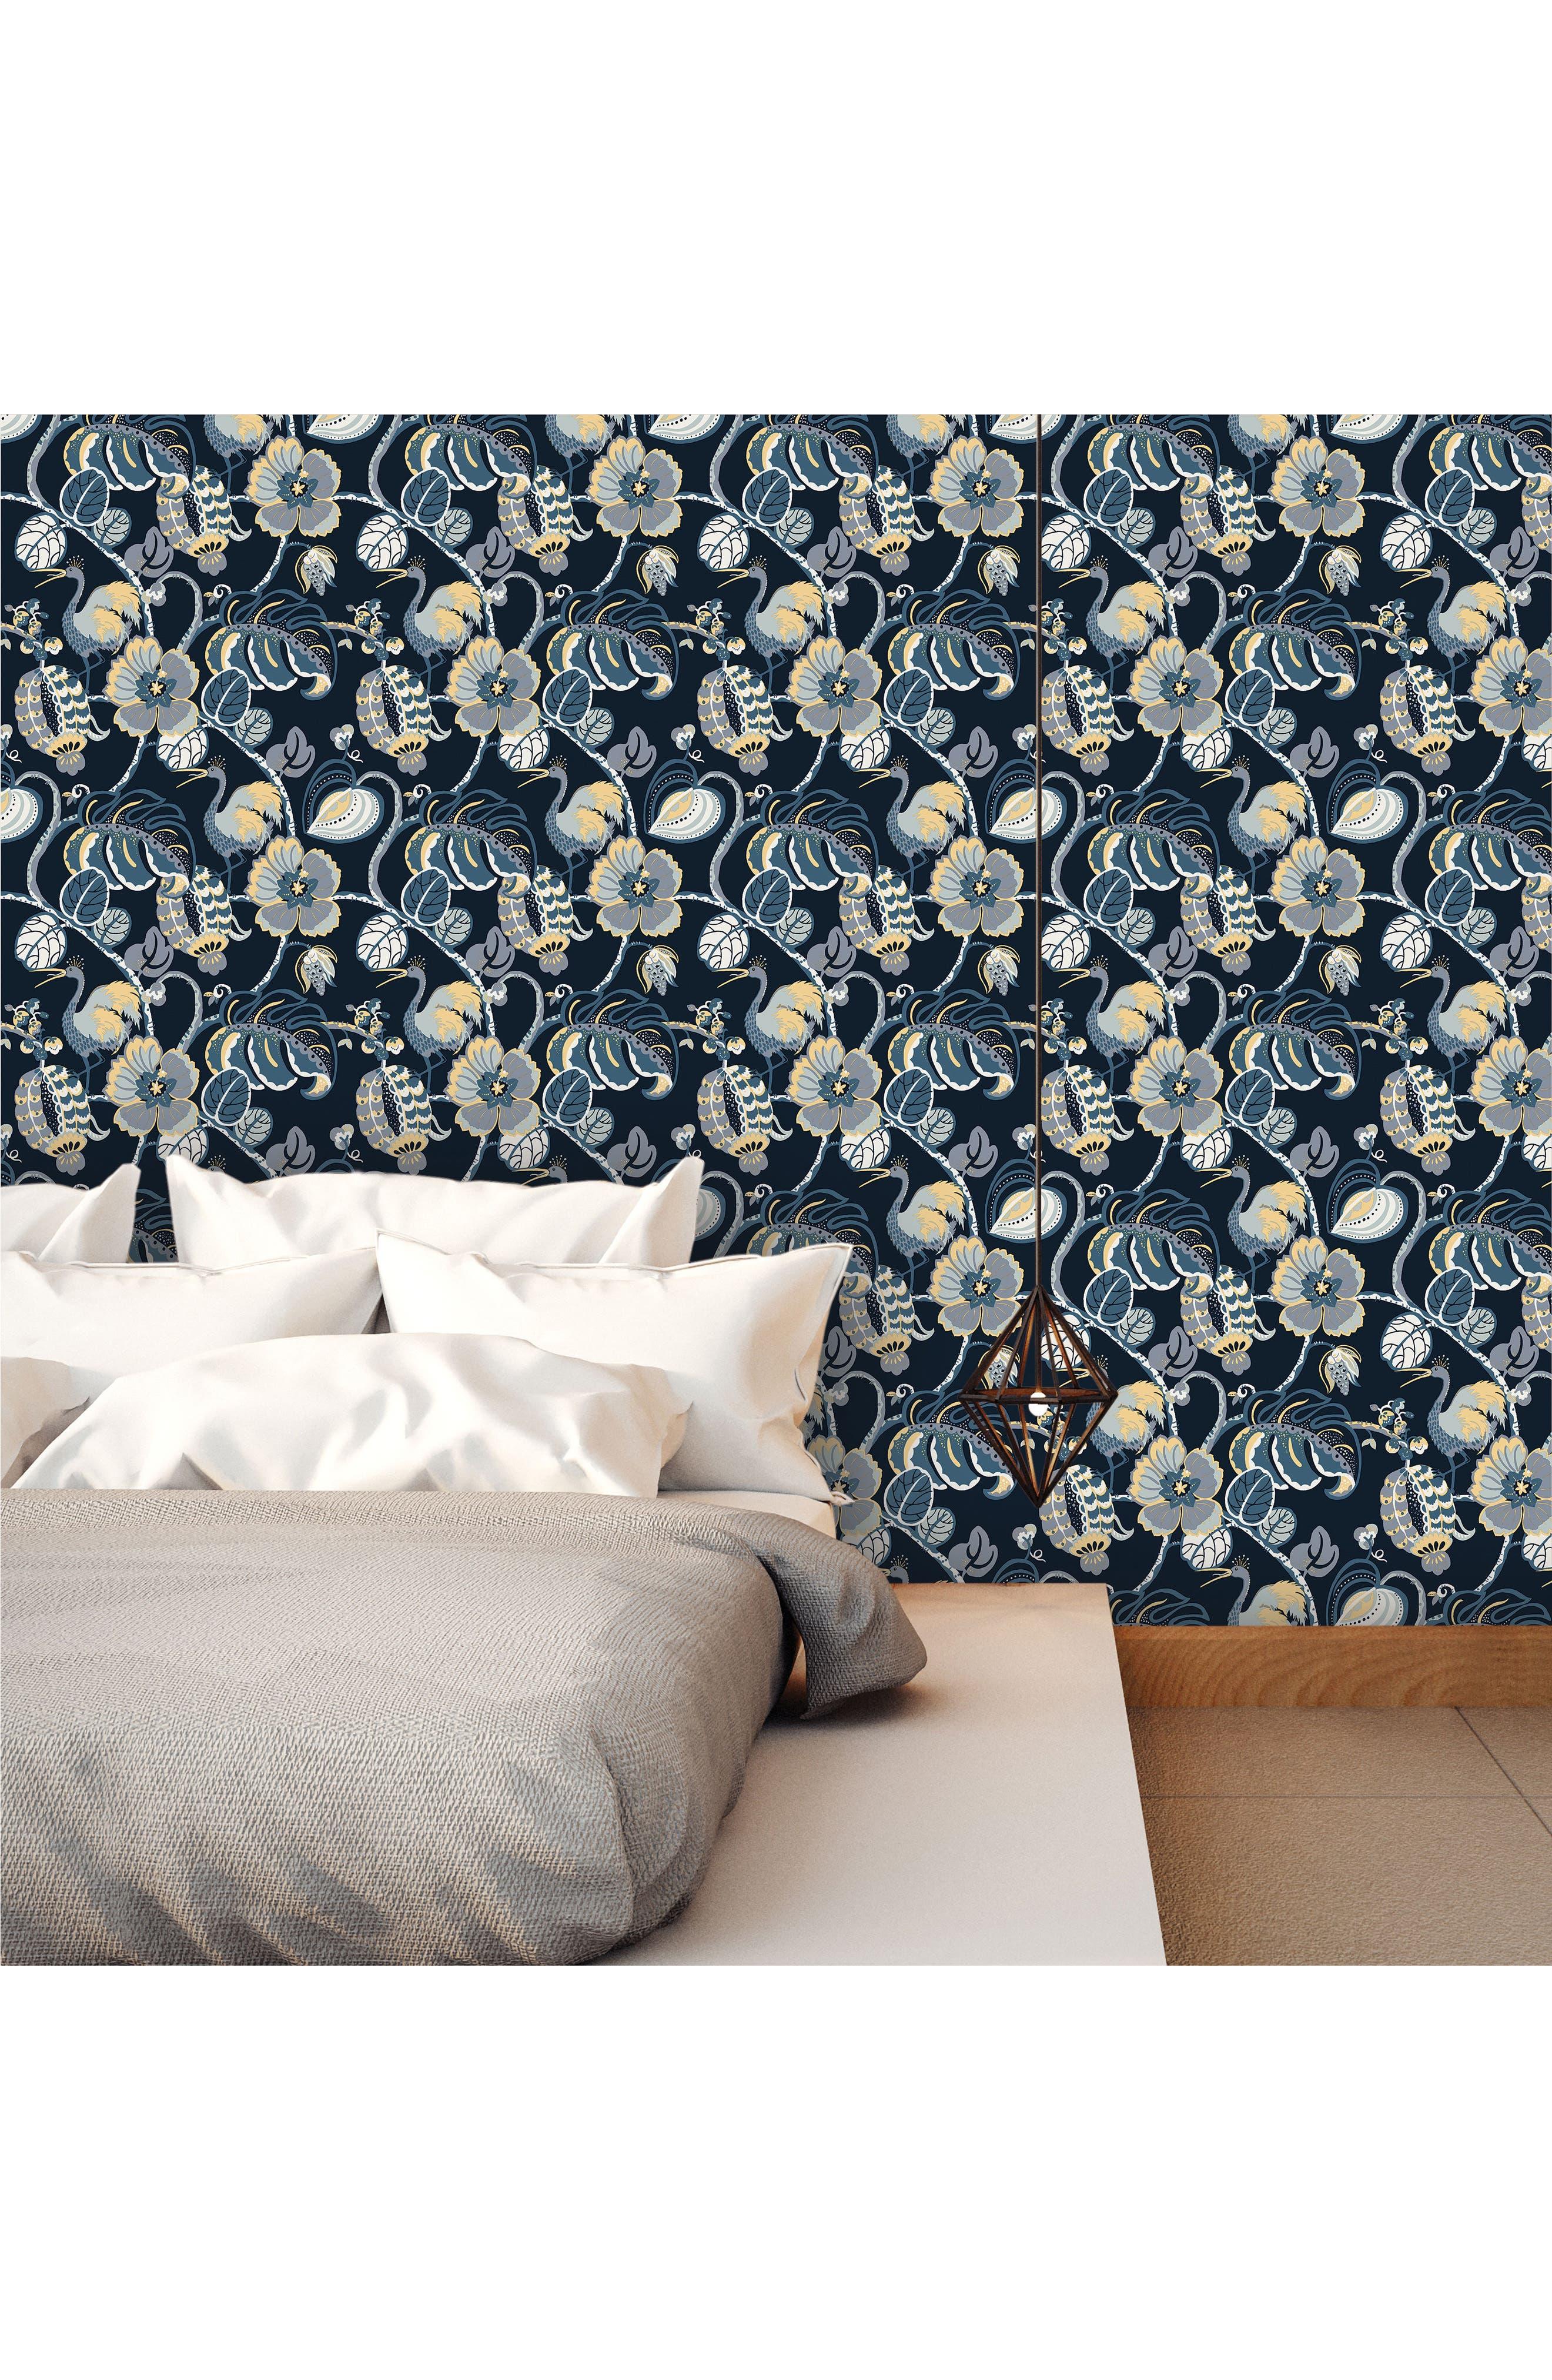 Tropical Fête Self-Adhesive Vinyl Wallpaper,                             Alternate thumbnail 2, color,                             Azure Blue